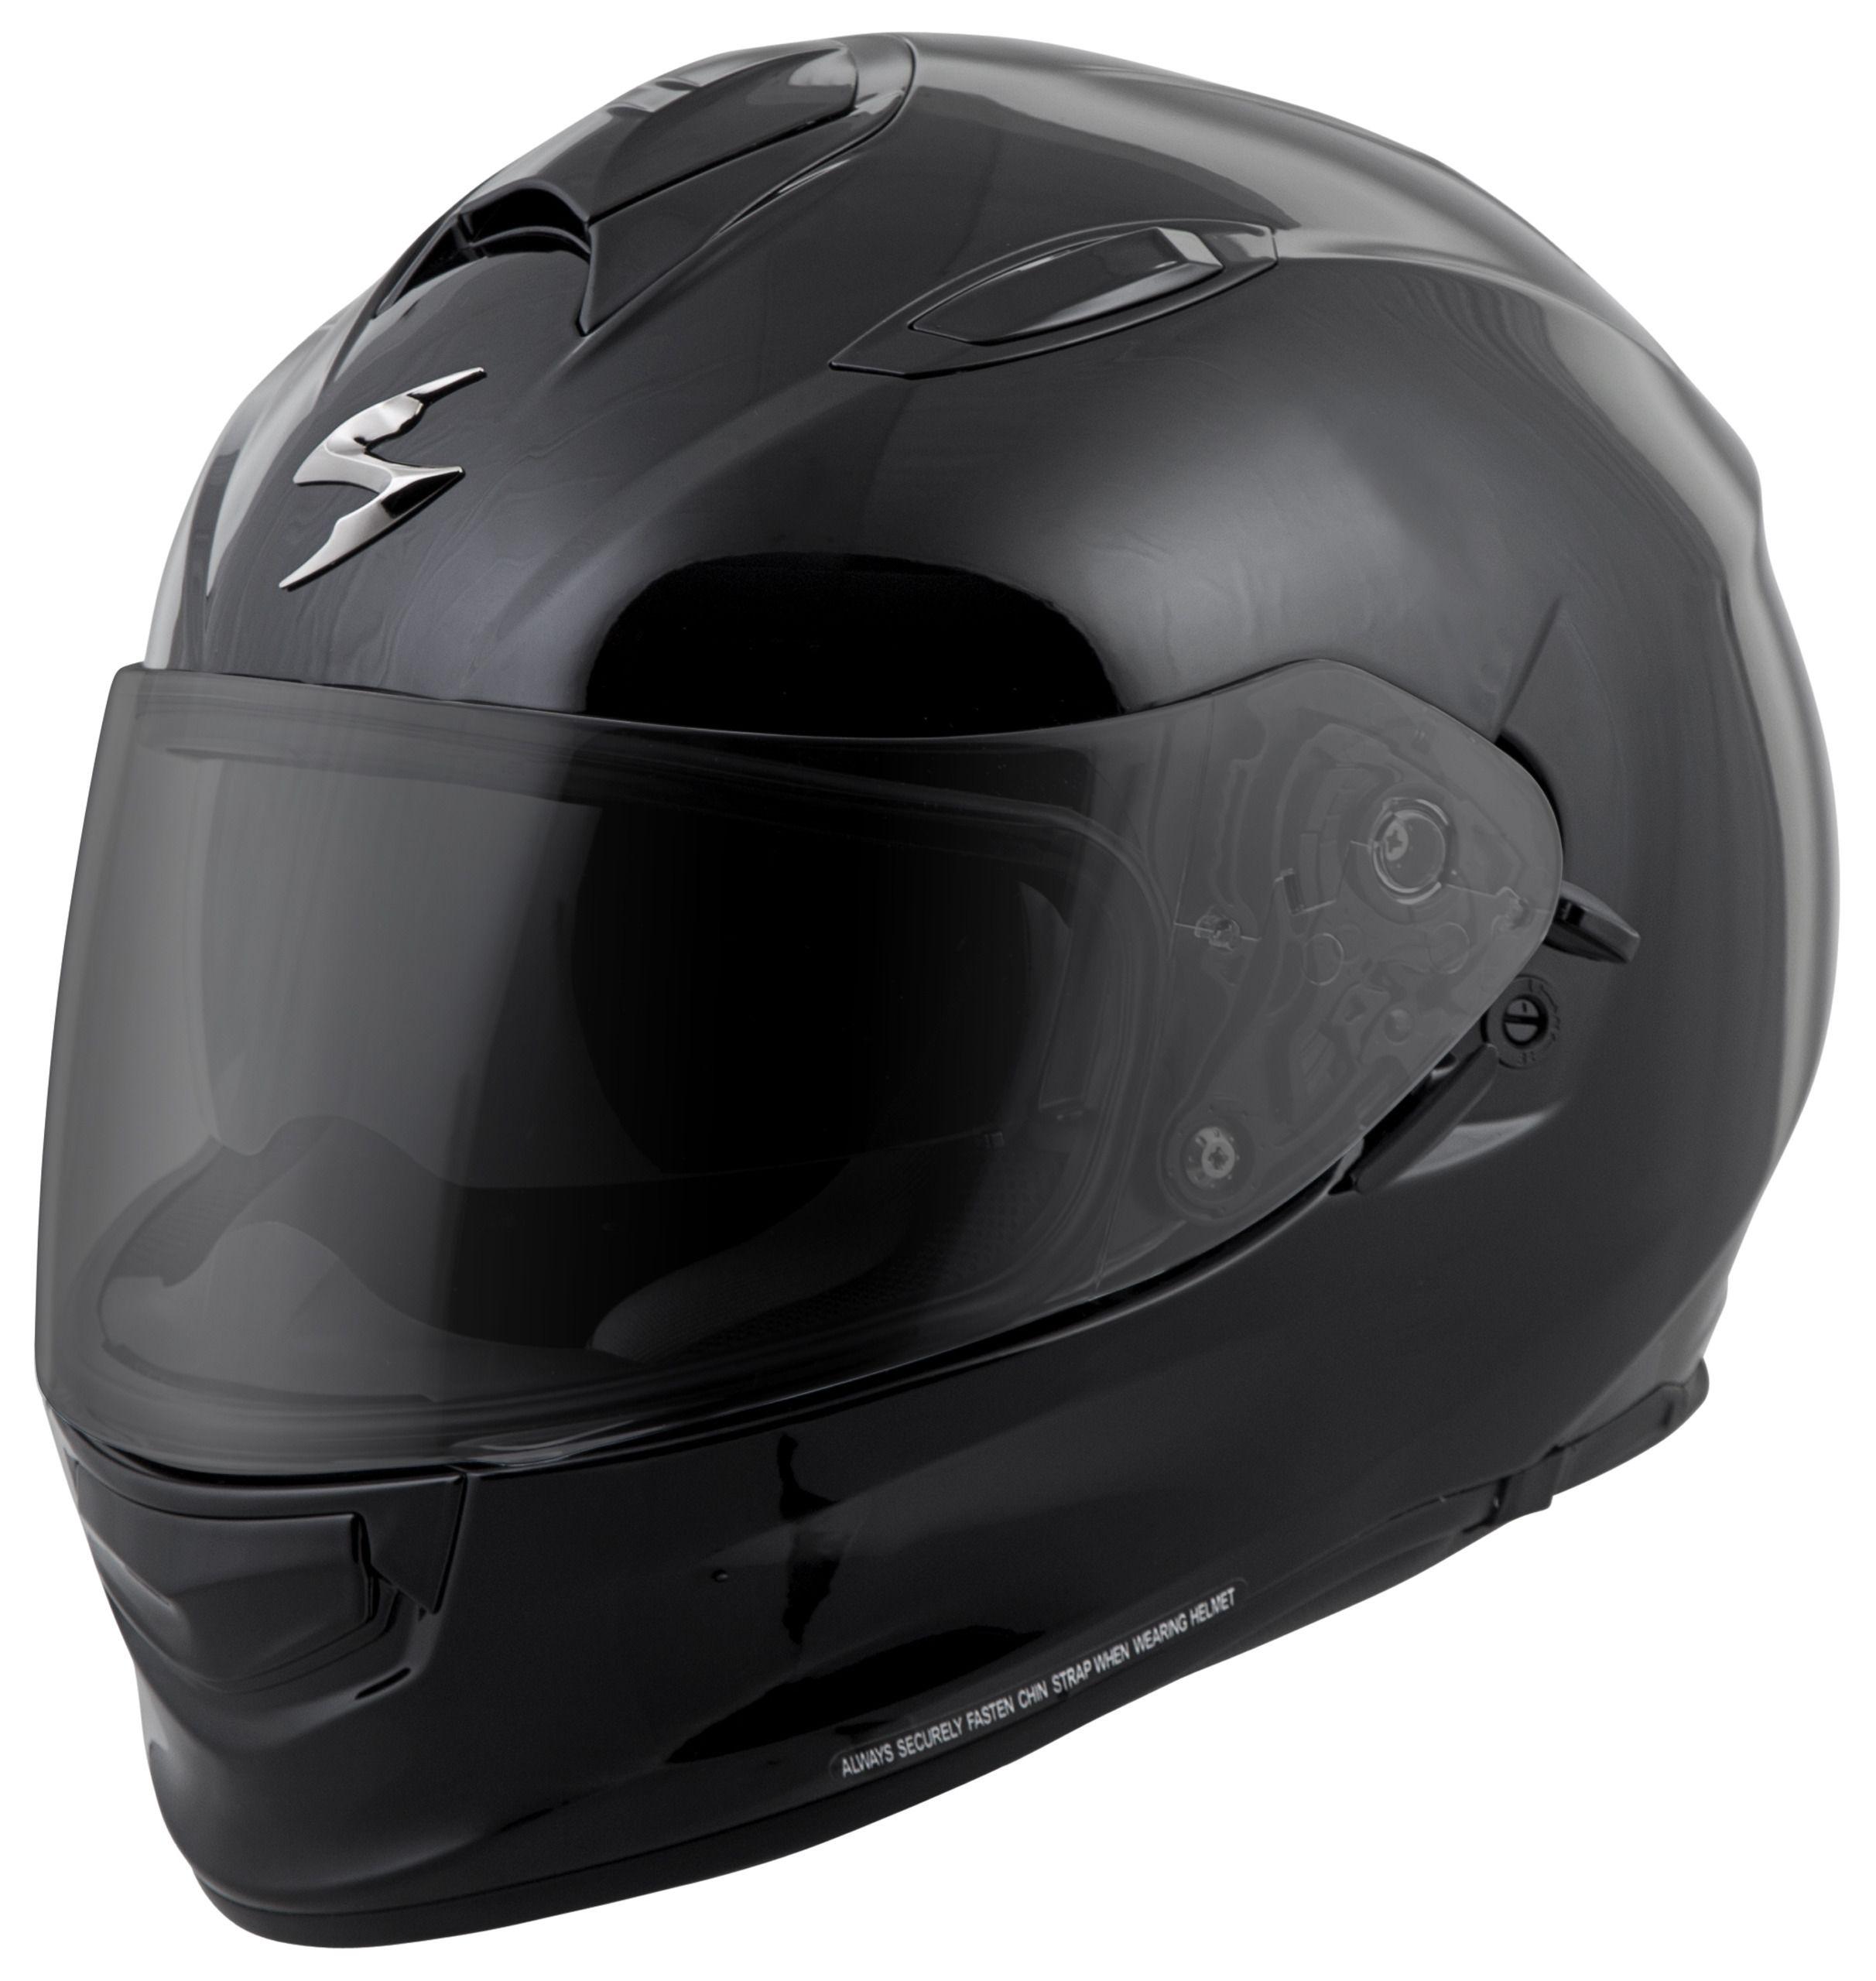 scorpion exo t510 helmet revzilla. Black Bedroom Furniture Sets. Home Design Ideas